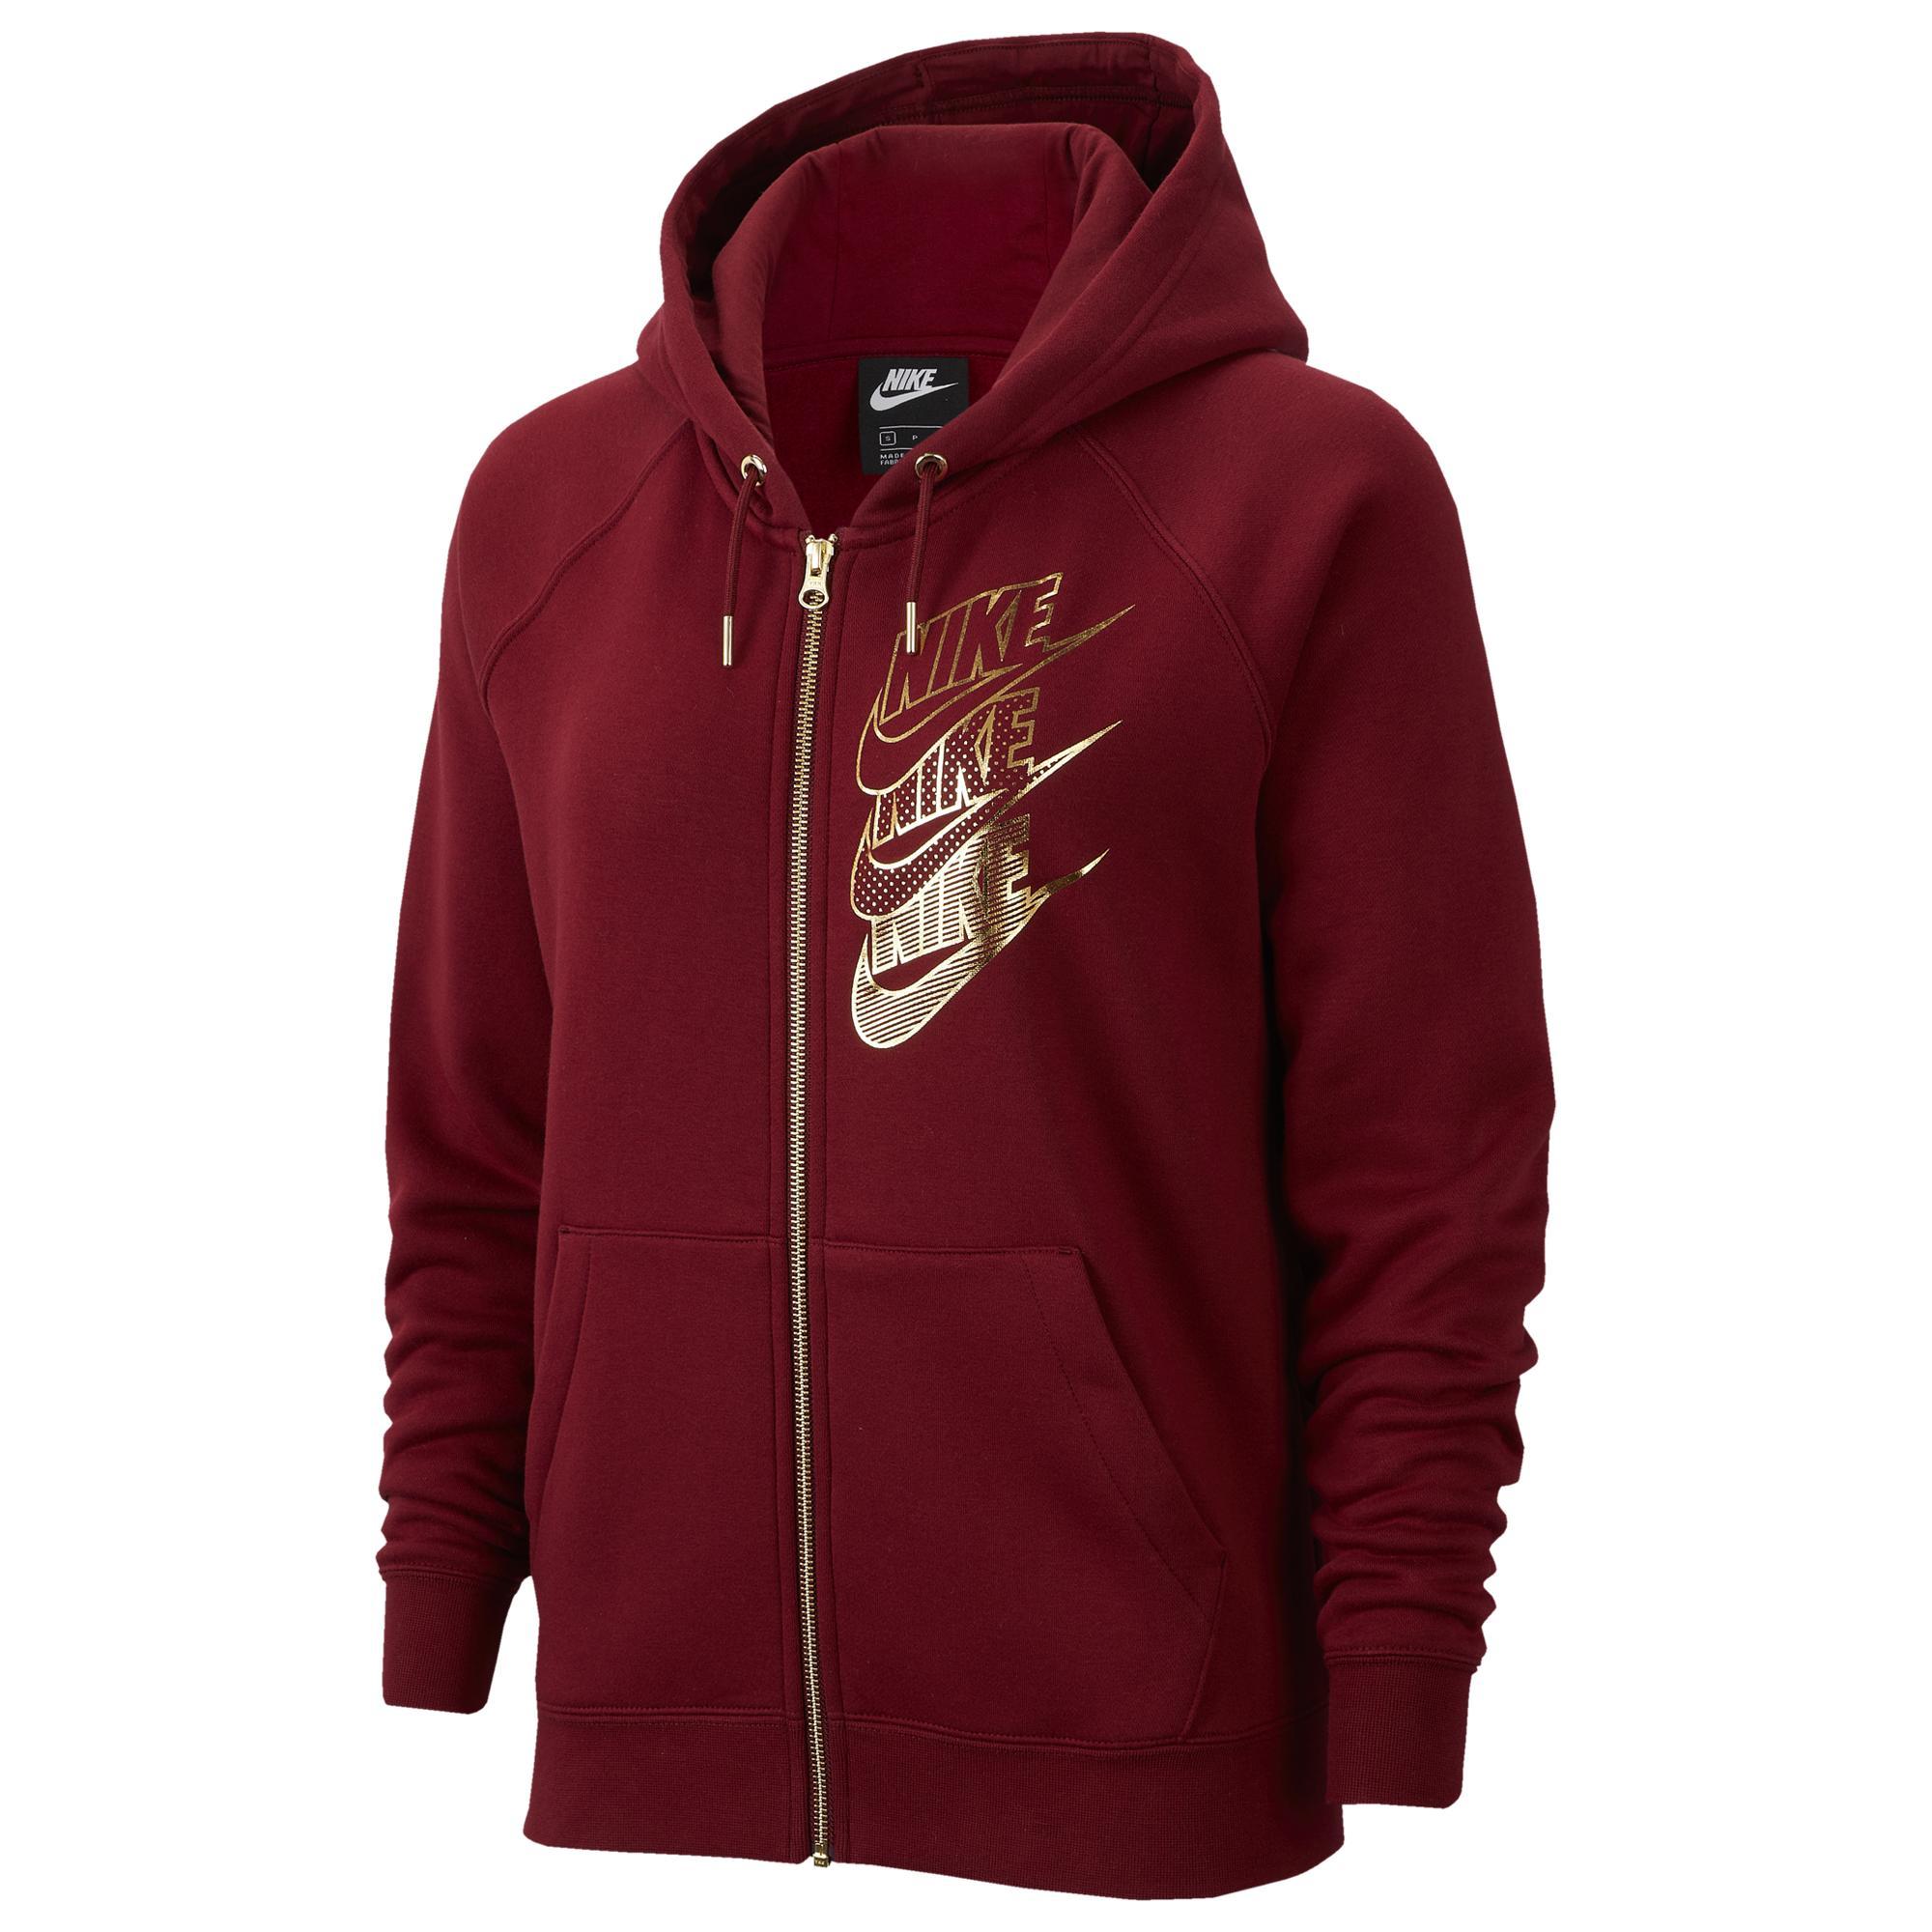 Nike Sportswear Full Zip Hoodie Women team red metallic gold